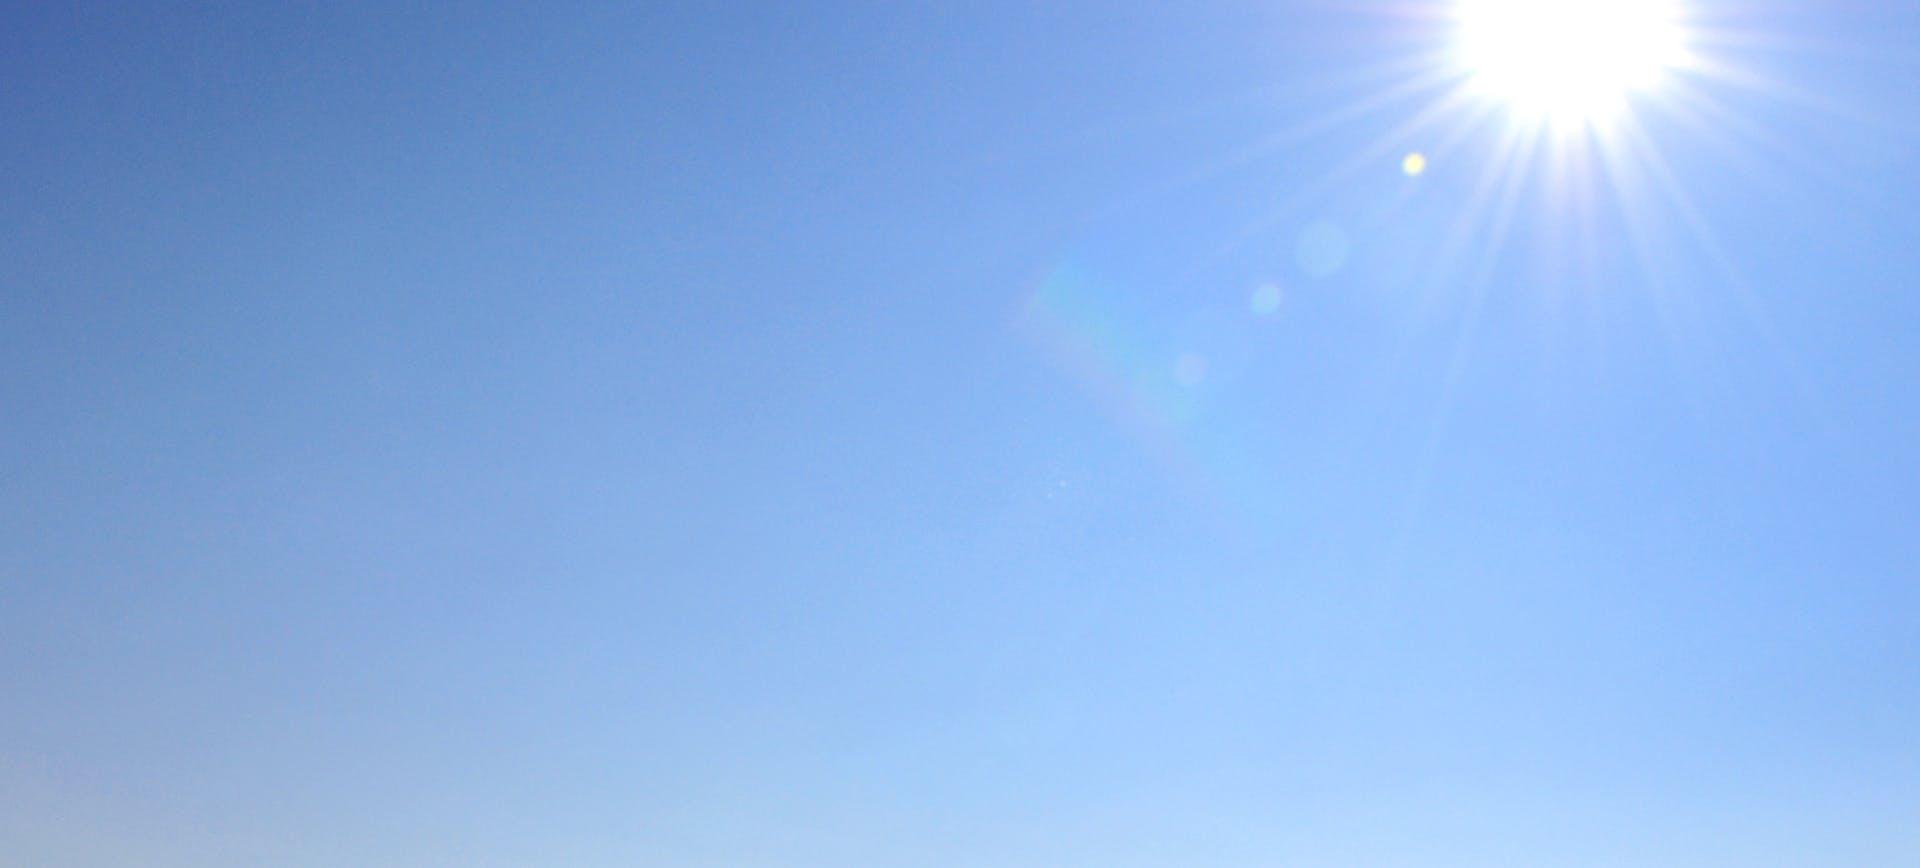 Blue sky with bright sunshine